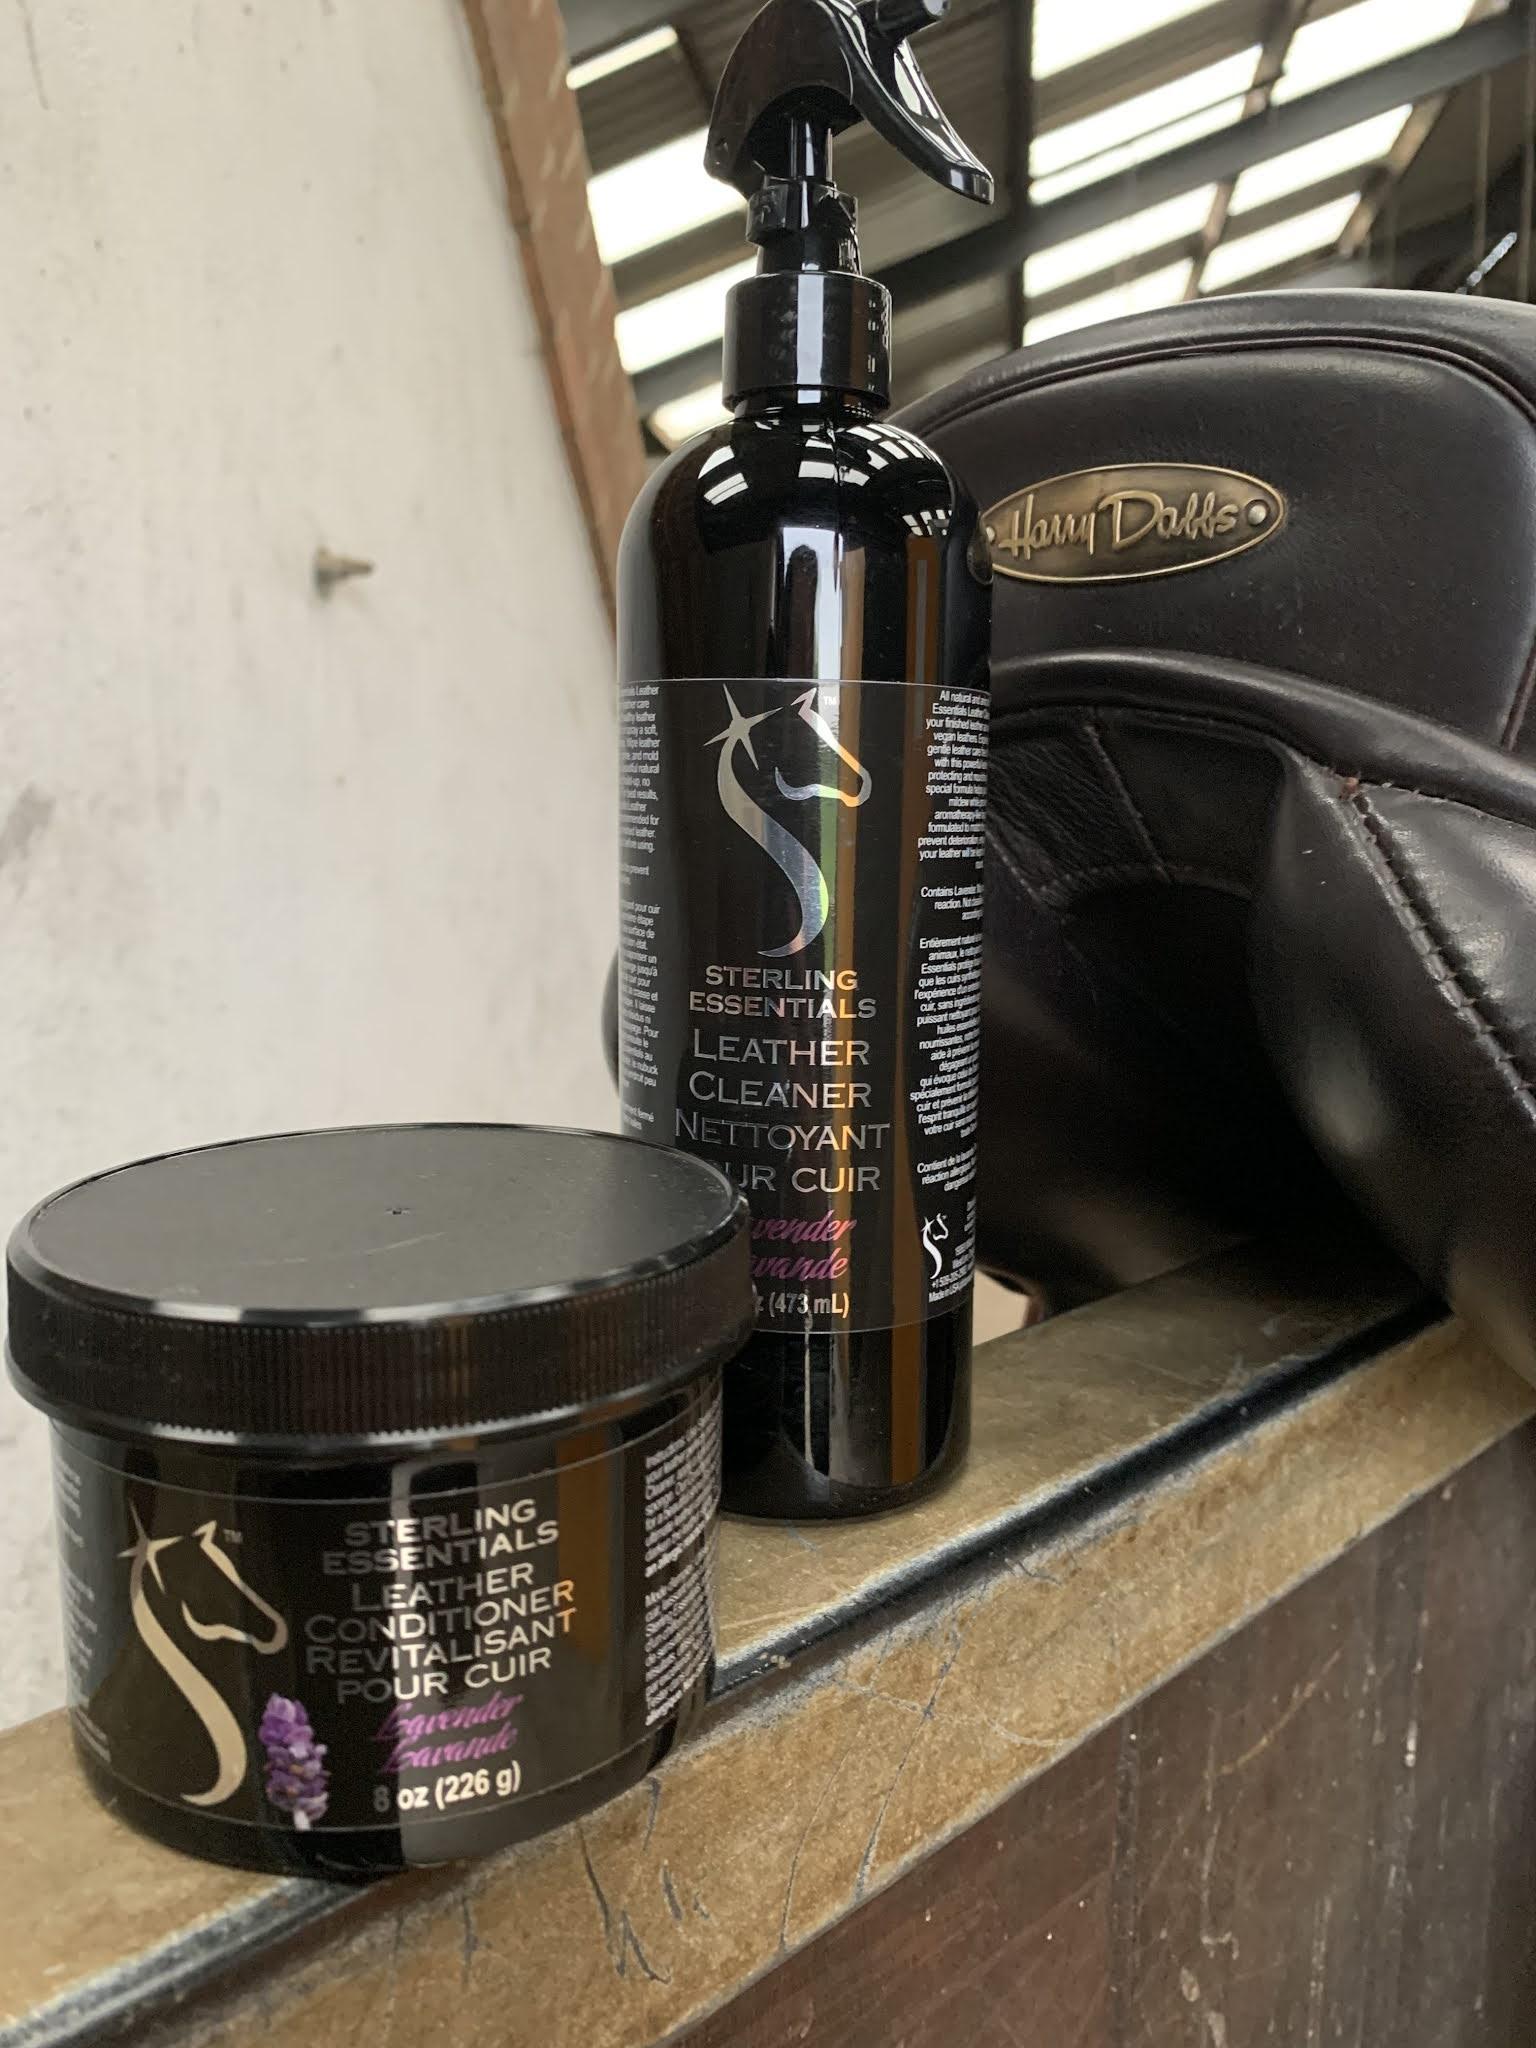 Sterling Essentials Lavender Leather Cleaner & Conditioner